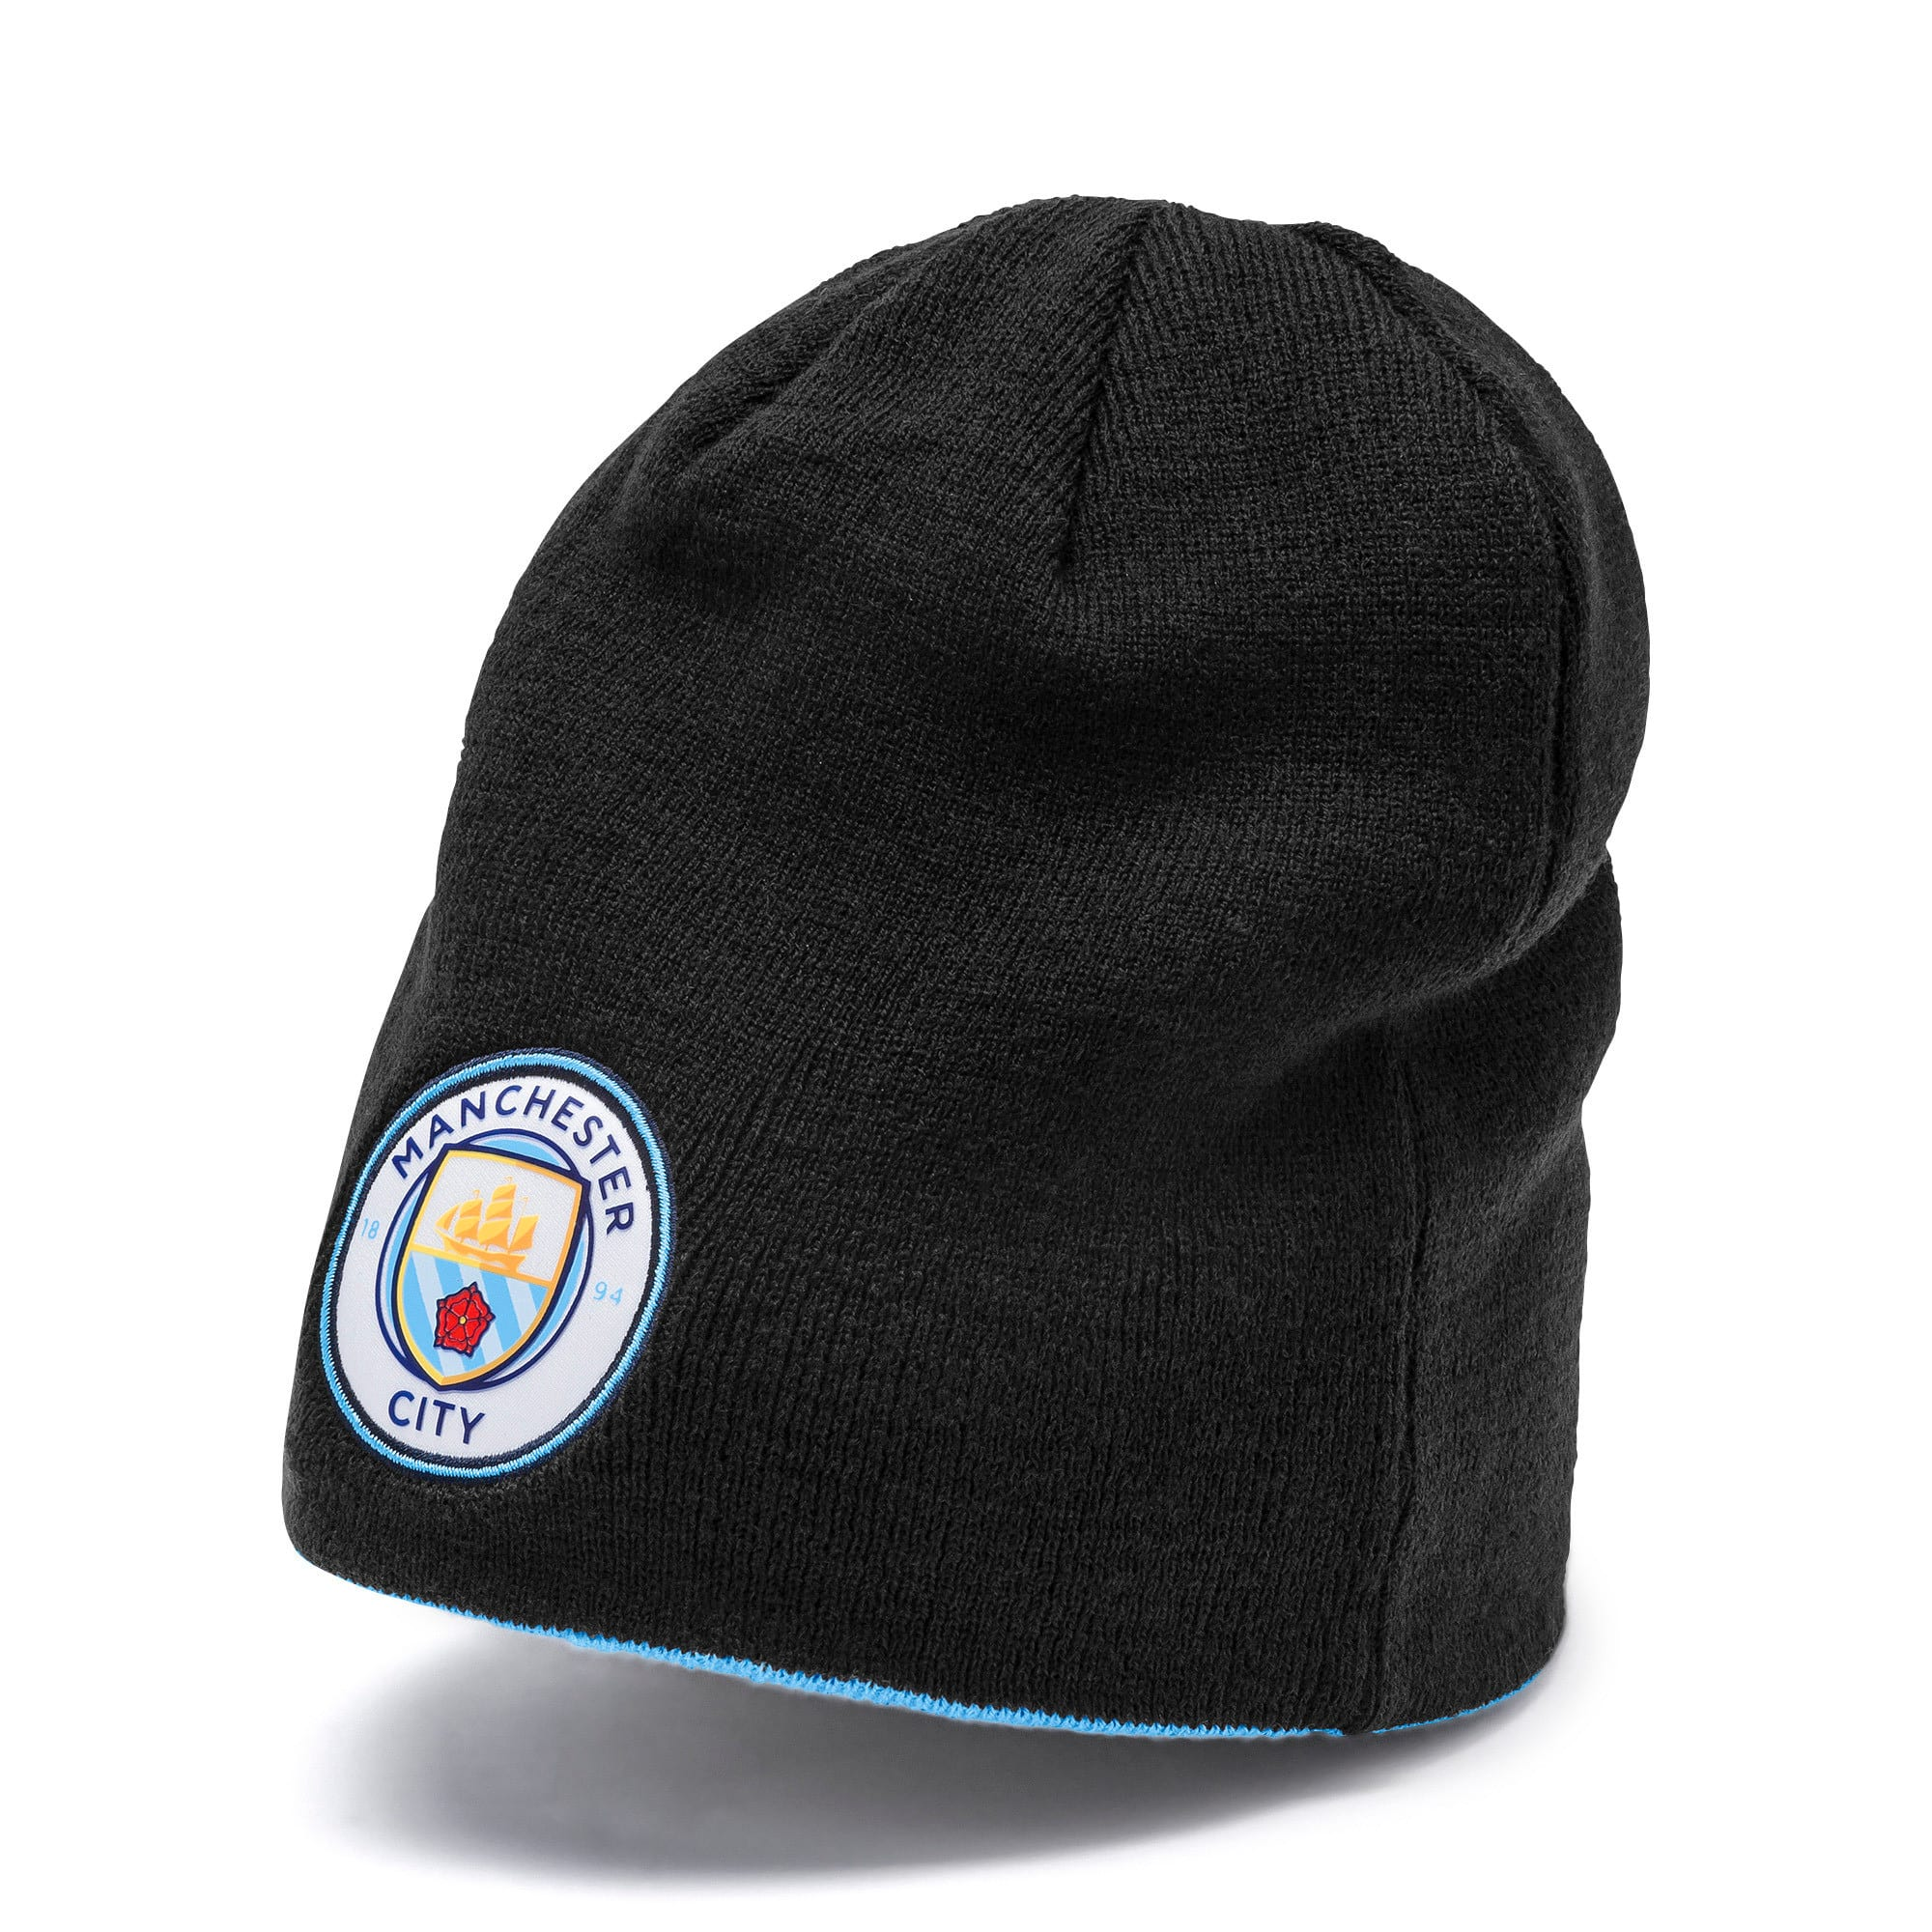 Thumbnail 1 of Man City Reversible Beanie, Puma Black-Team Light Blue, medium